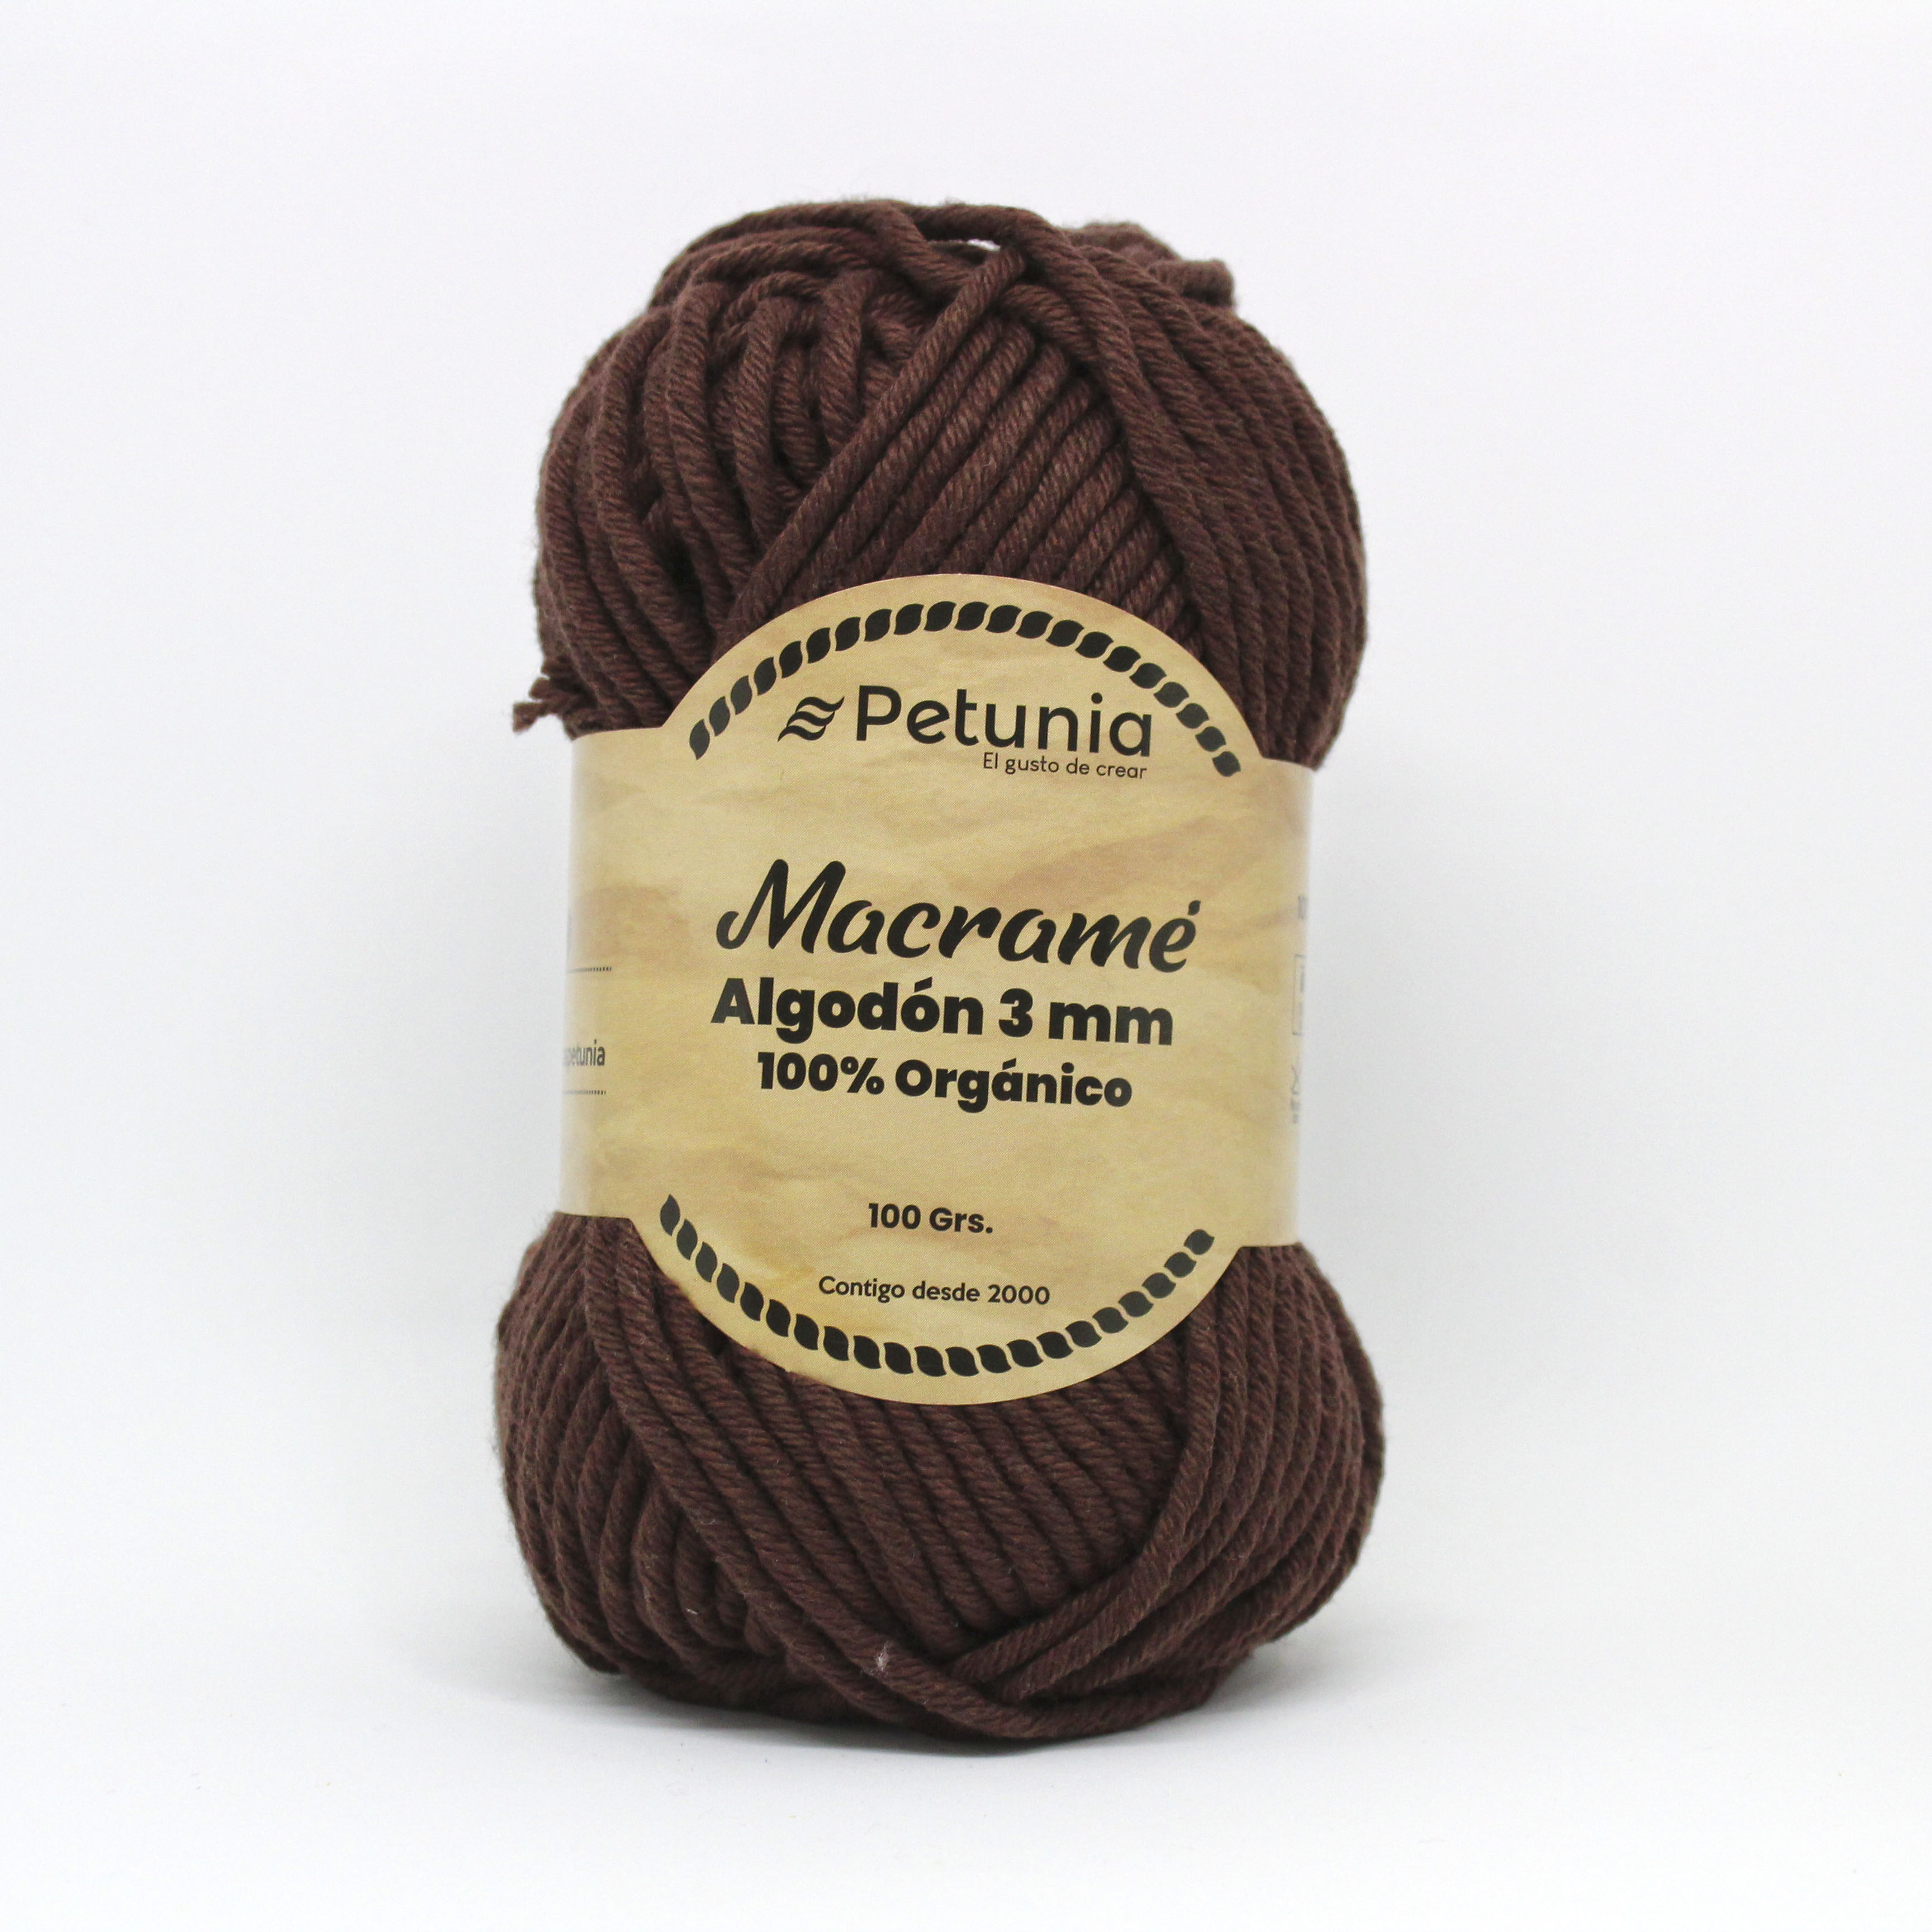 MACRAME ALGODON 3 MM - 6011